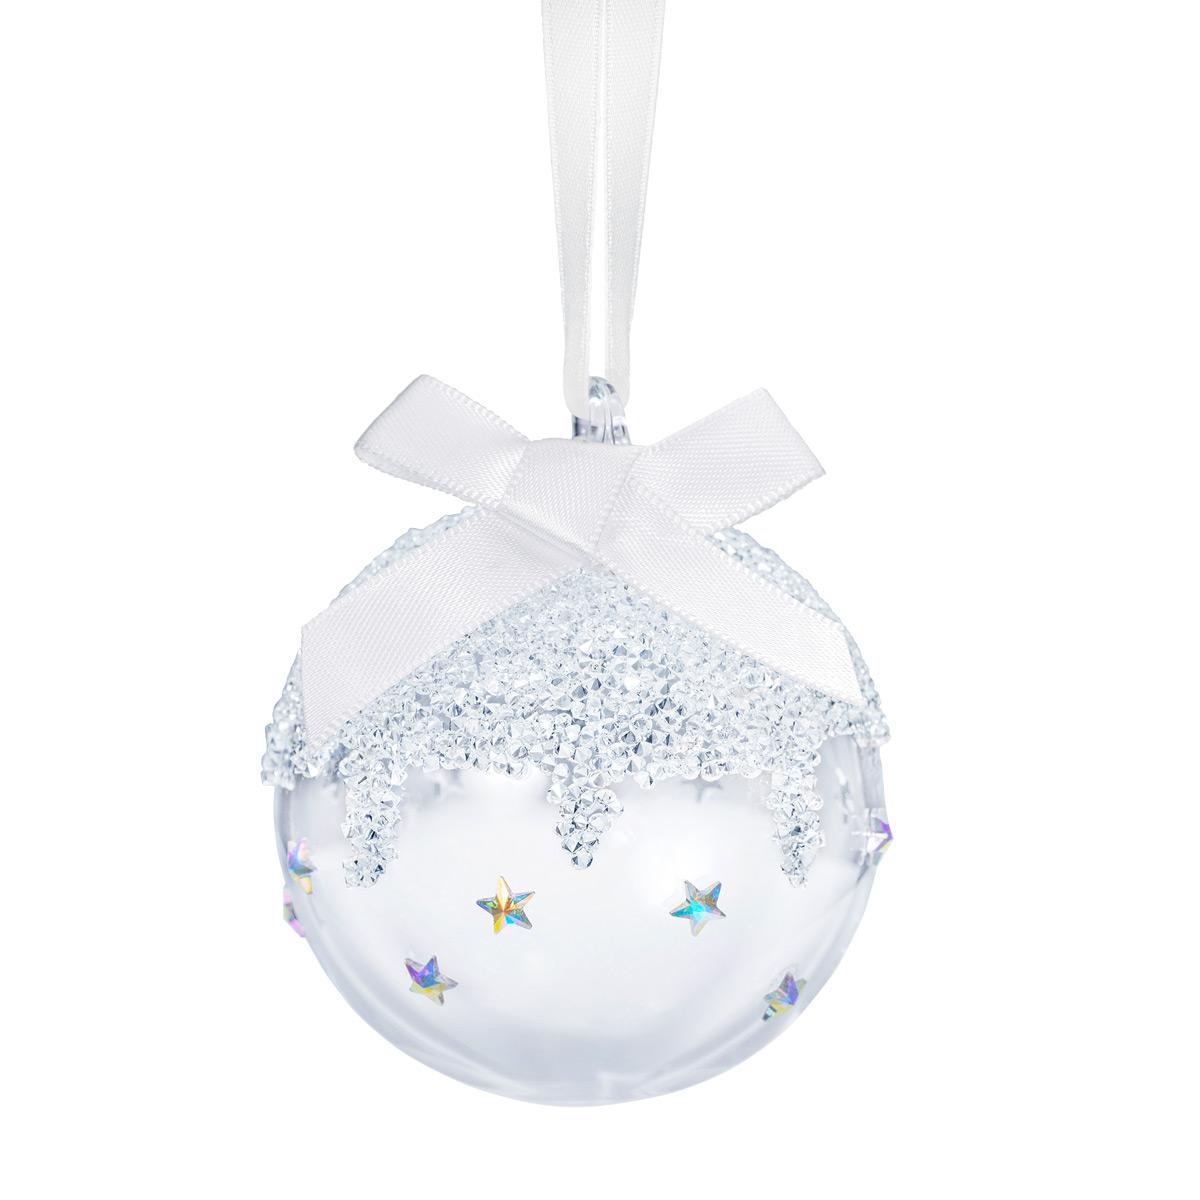 Swarovski 2019 Christmas Ball Ornament, Small